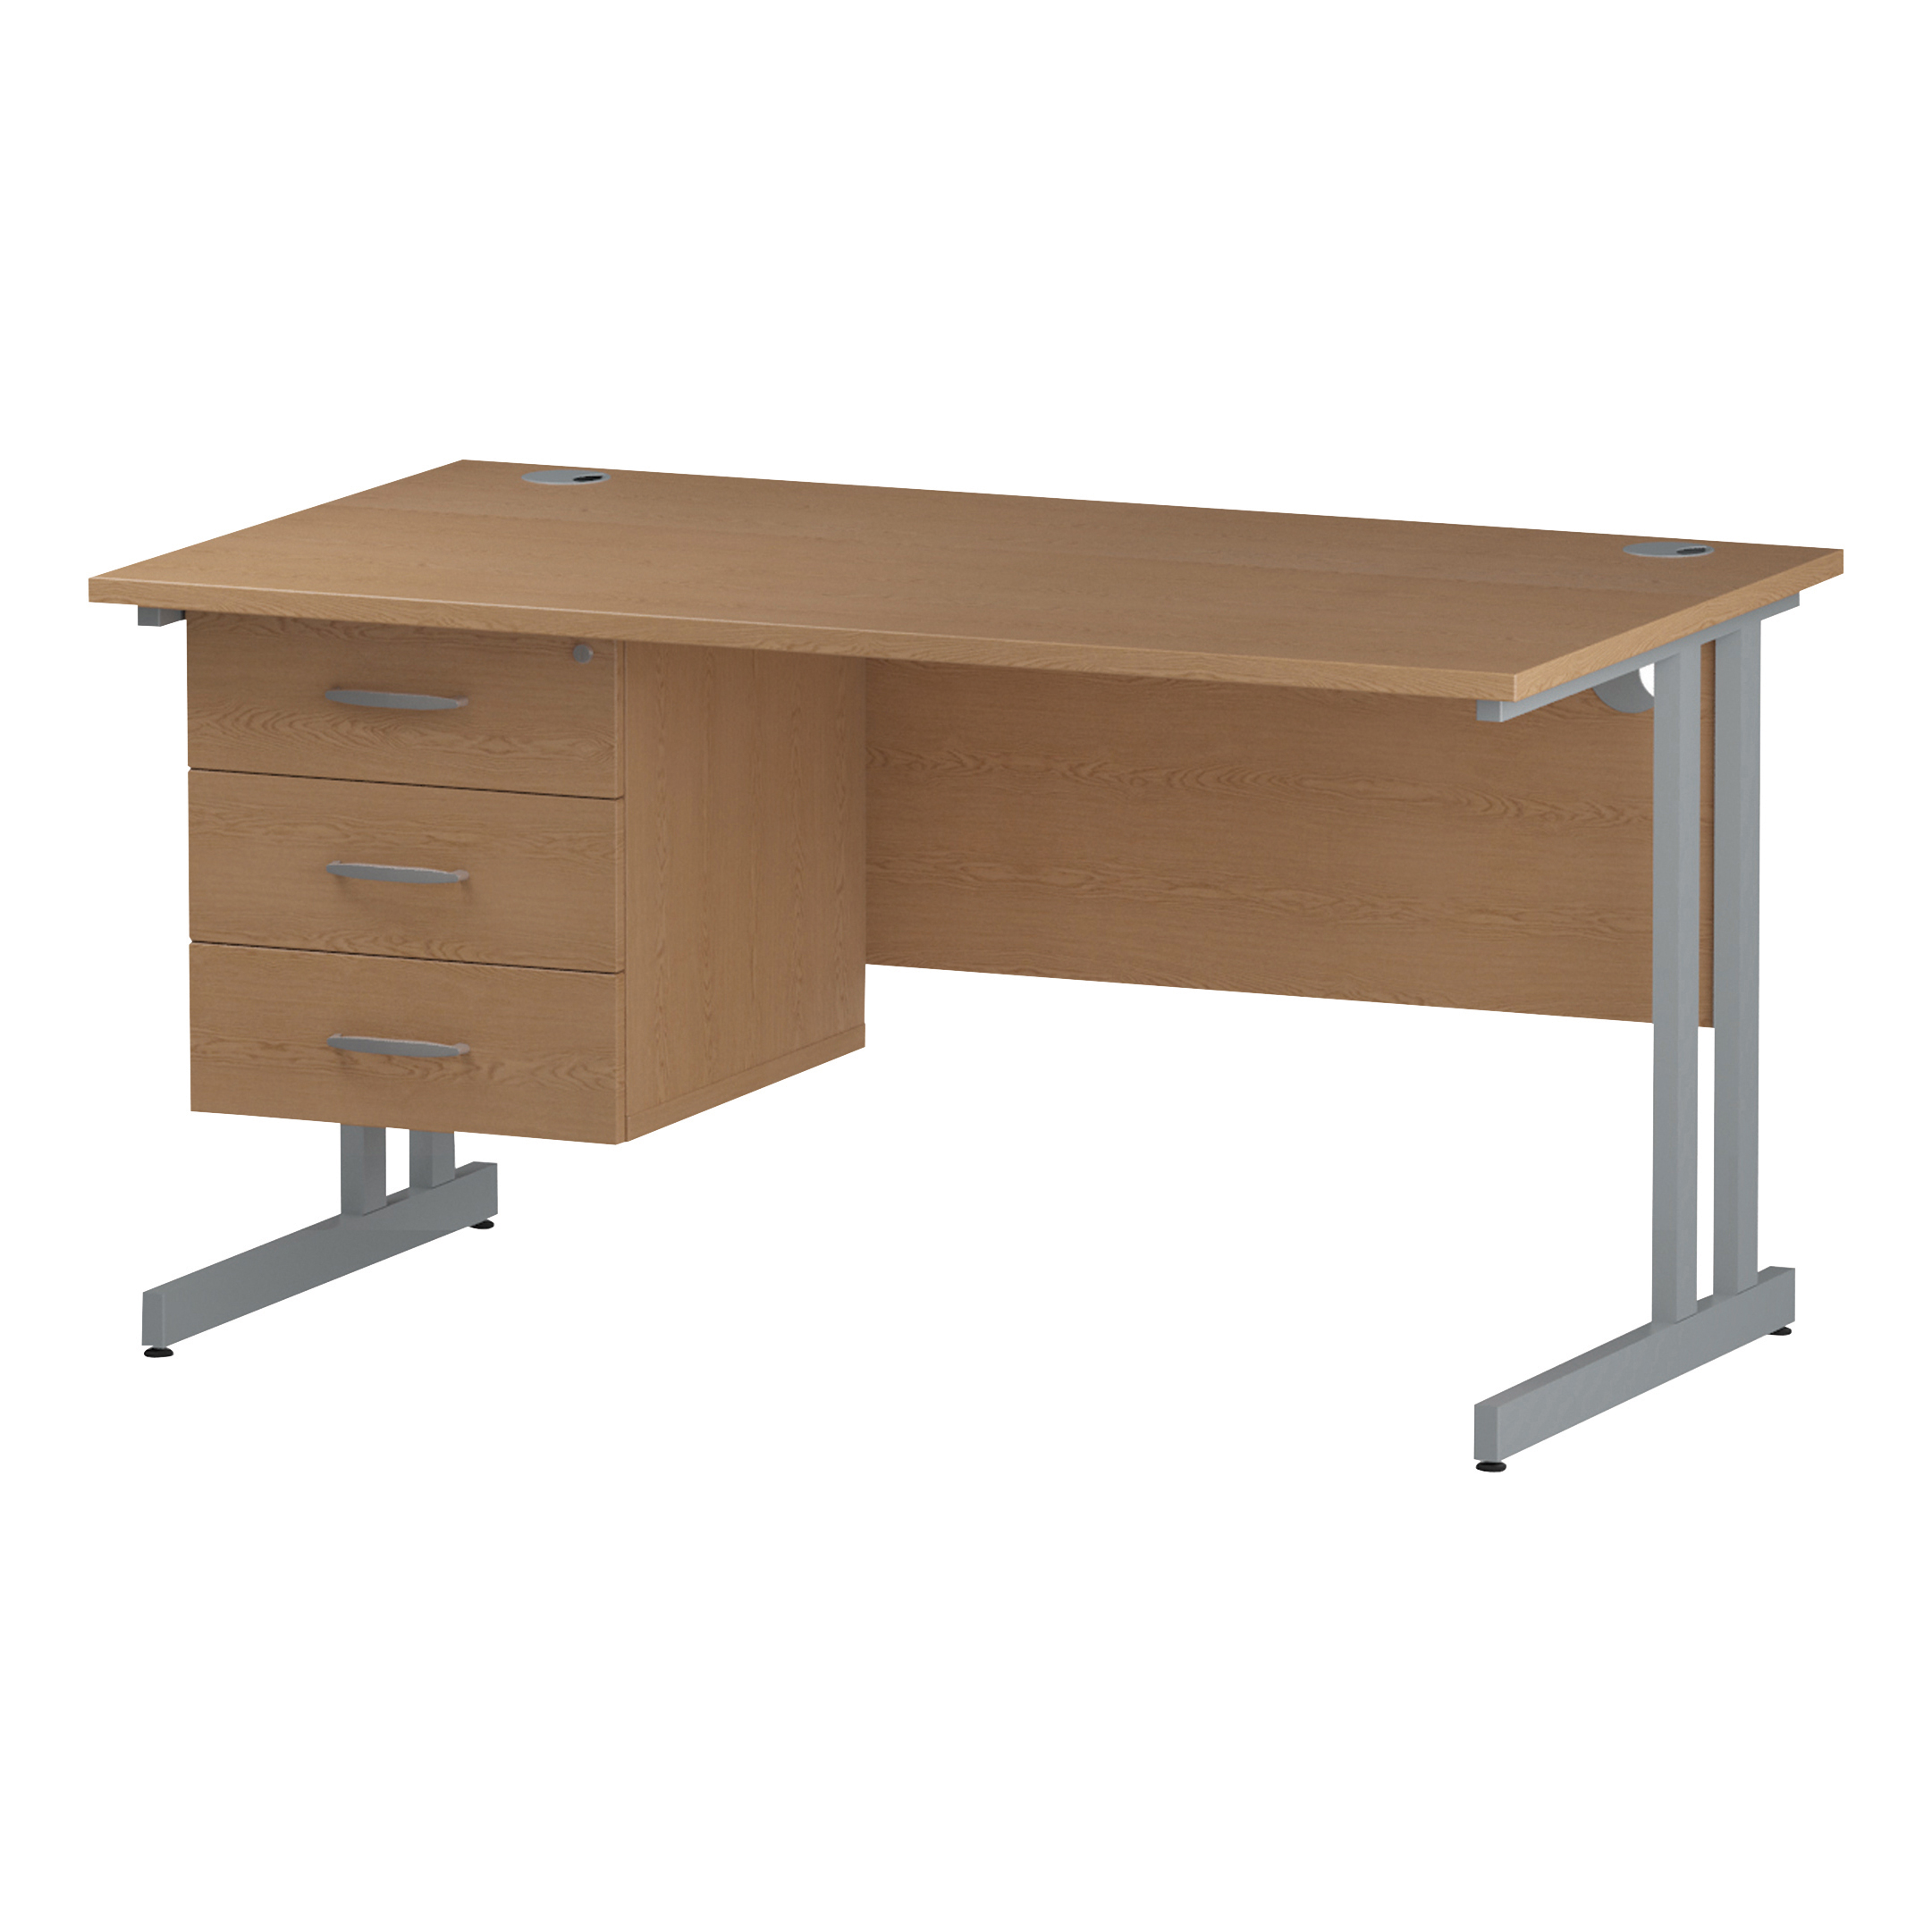 Trexus Rectangular Desk Silver Cantilever Leg 1400x800mm Fixed Pedestal 3 Drawers Oak Ref I002666